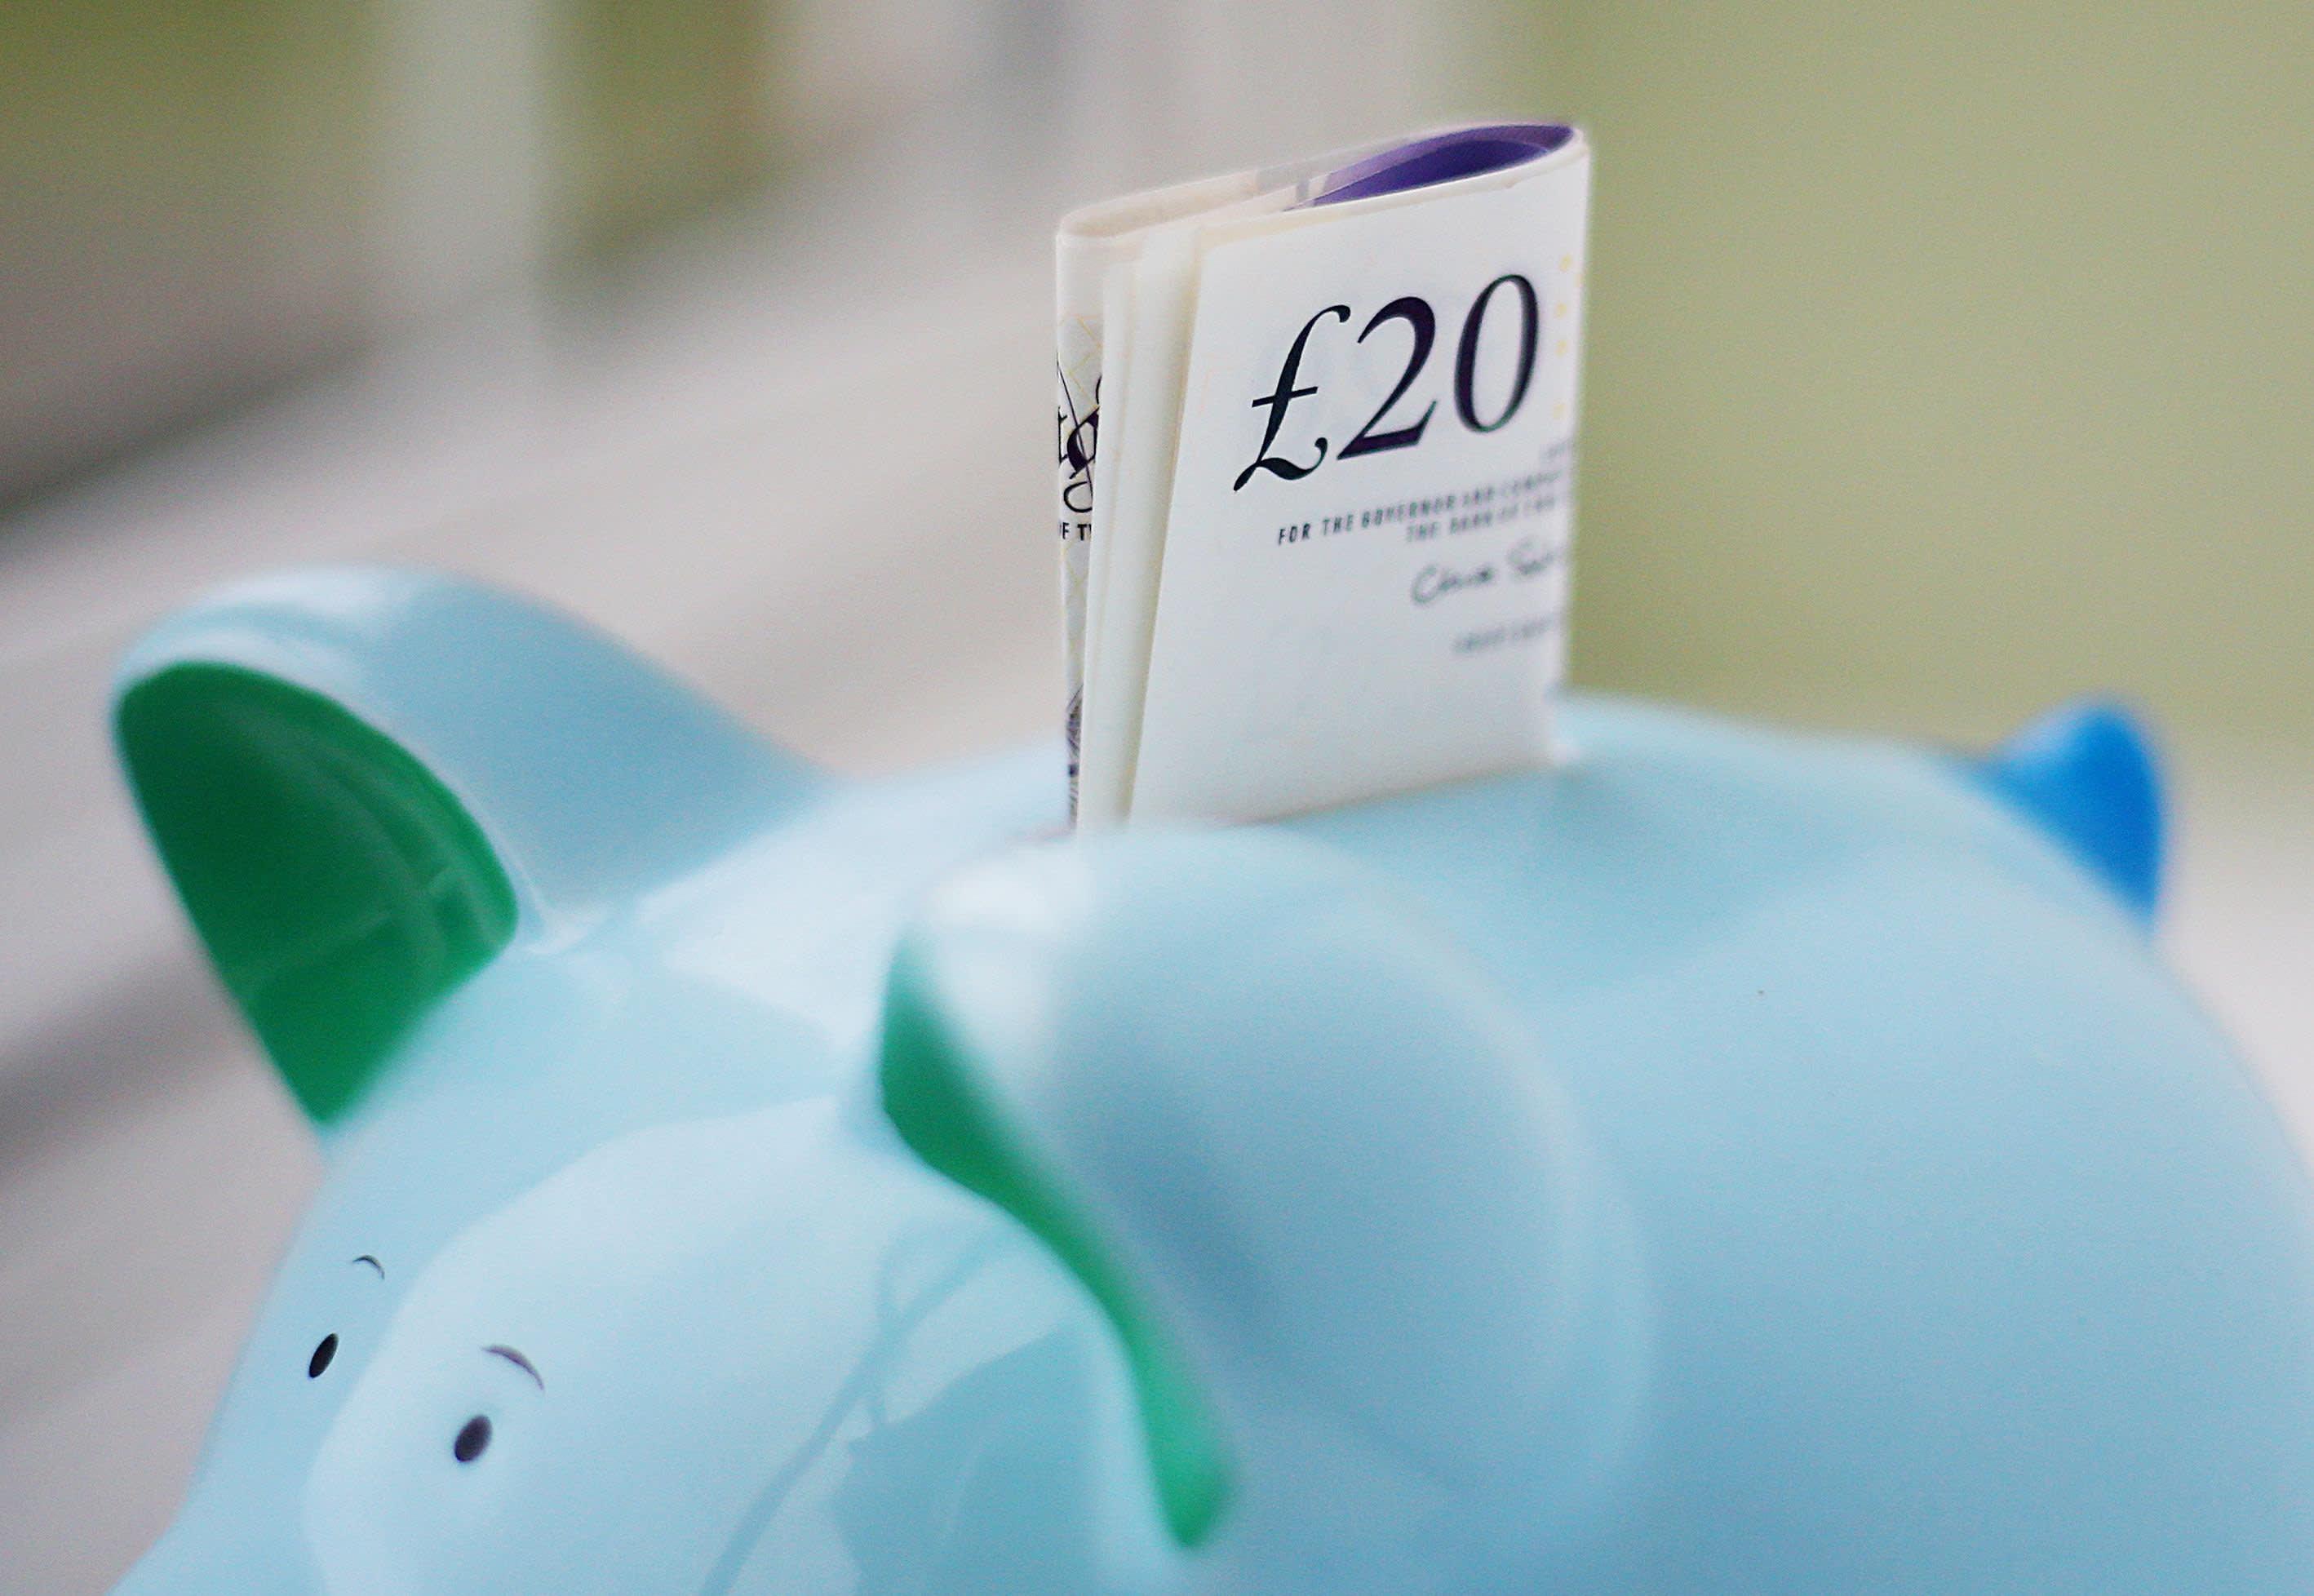 Last chance to take advantage of pension tax break